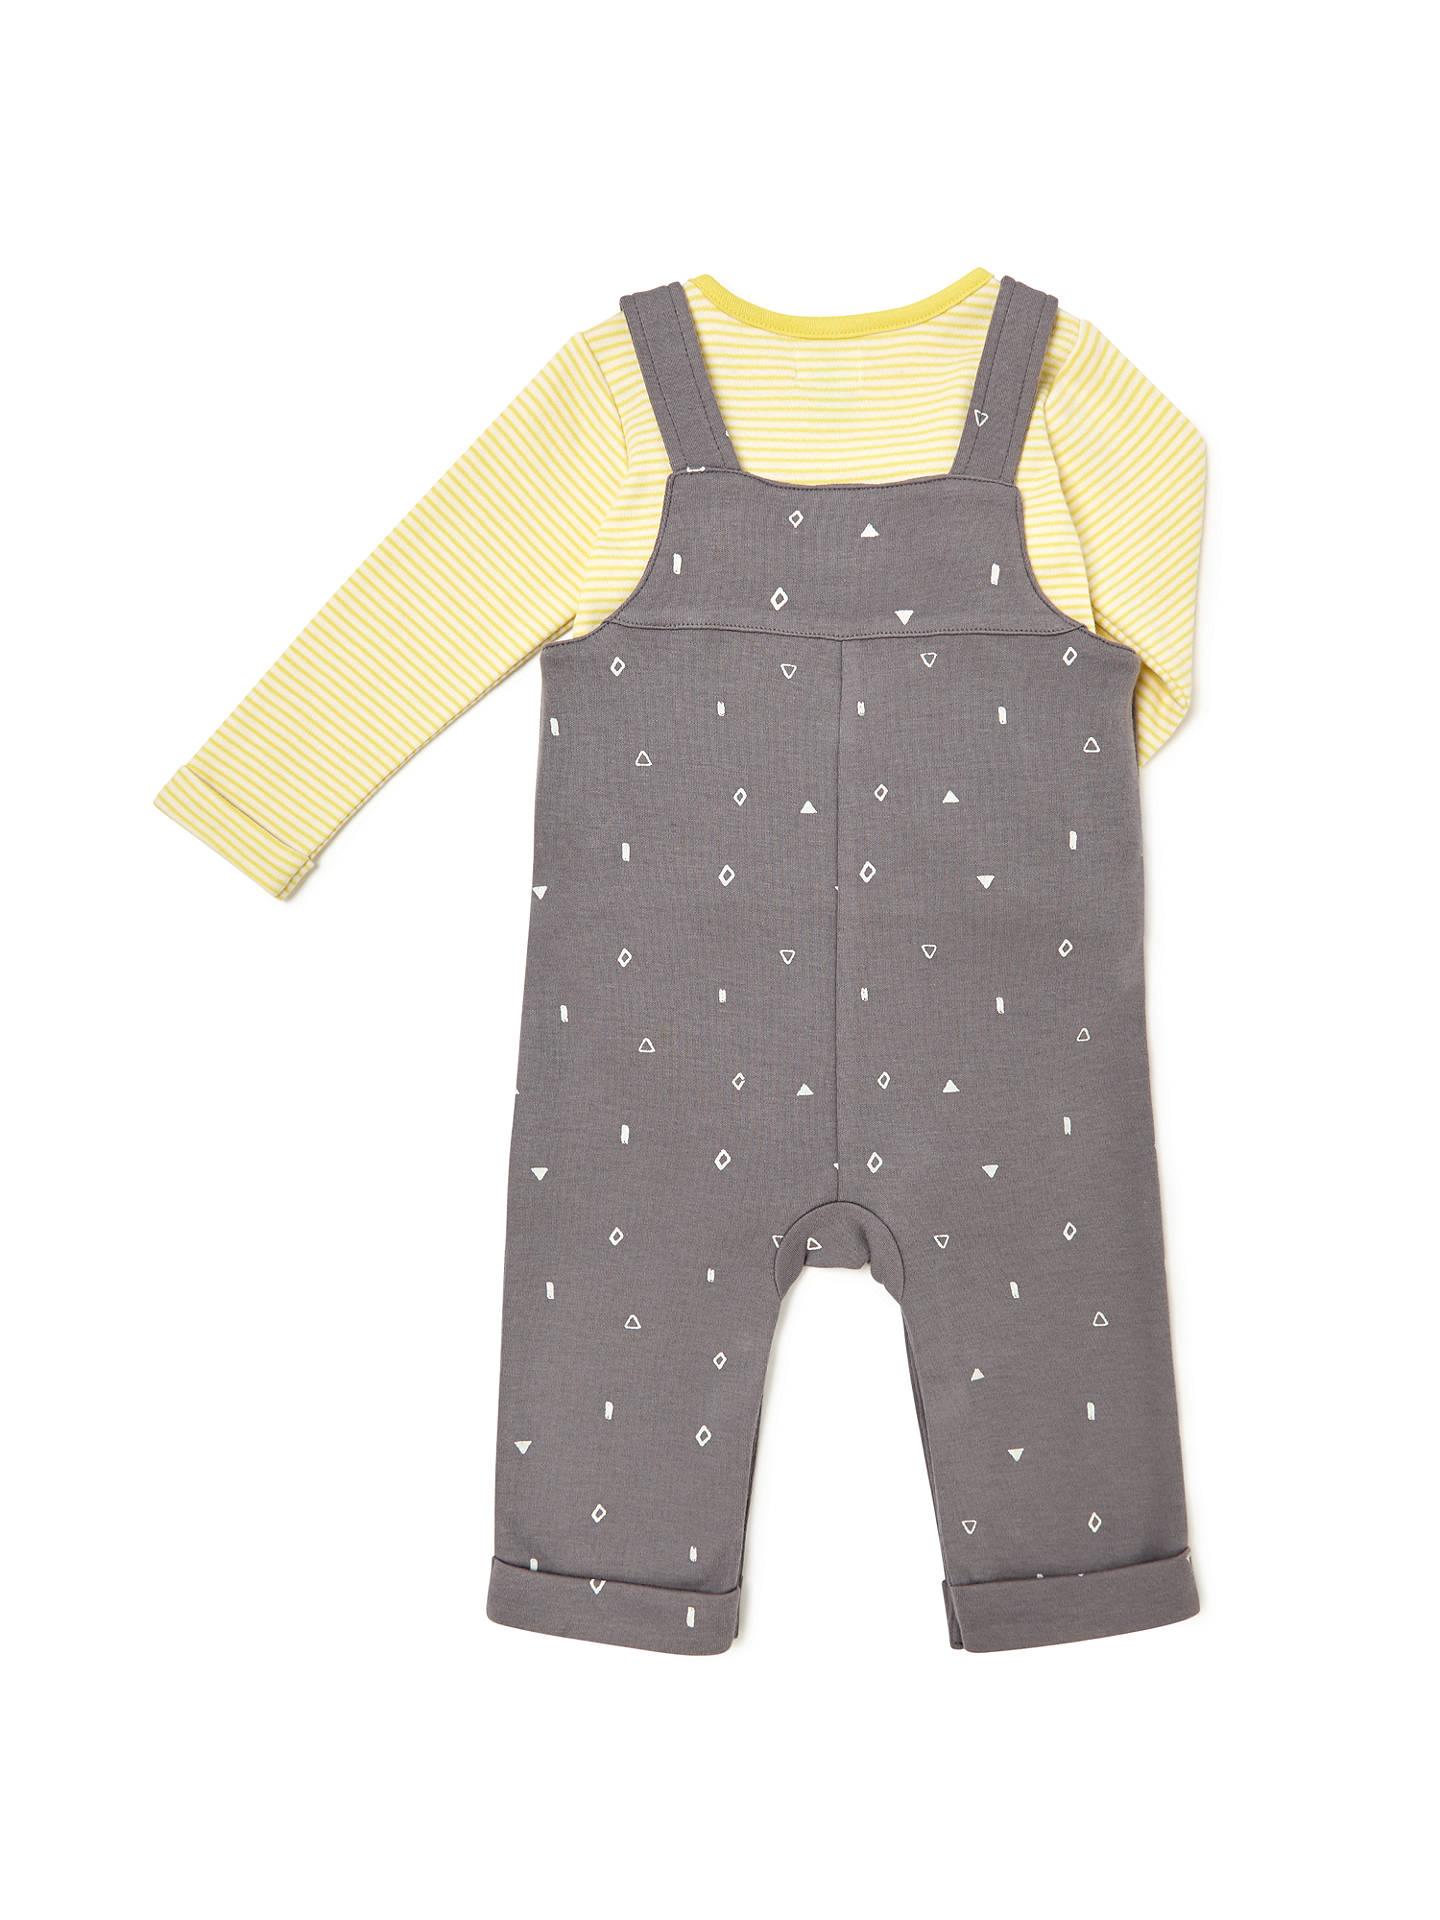 John Lewis Baby Shapes Jersey Dungaree And Top Set Grey Yellow Newborn